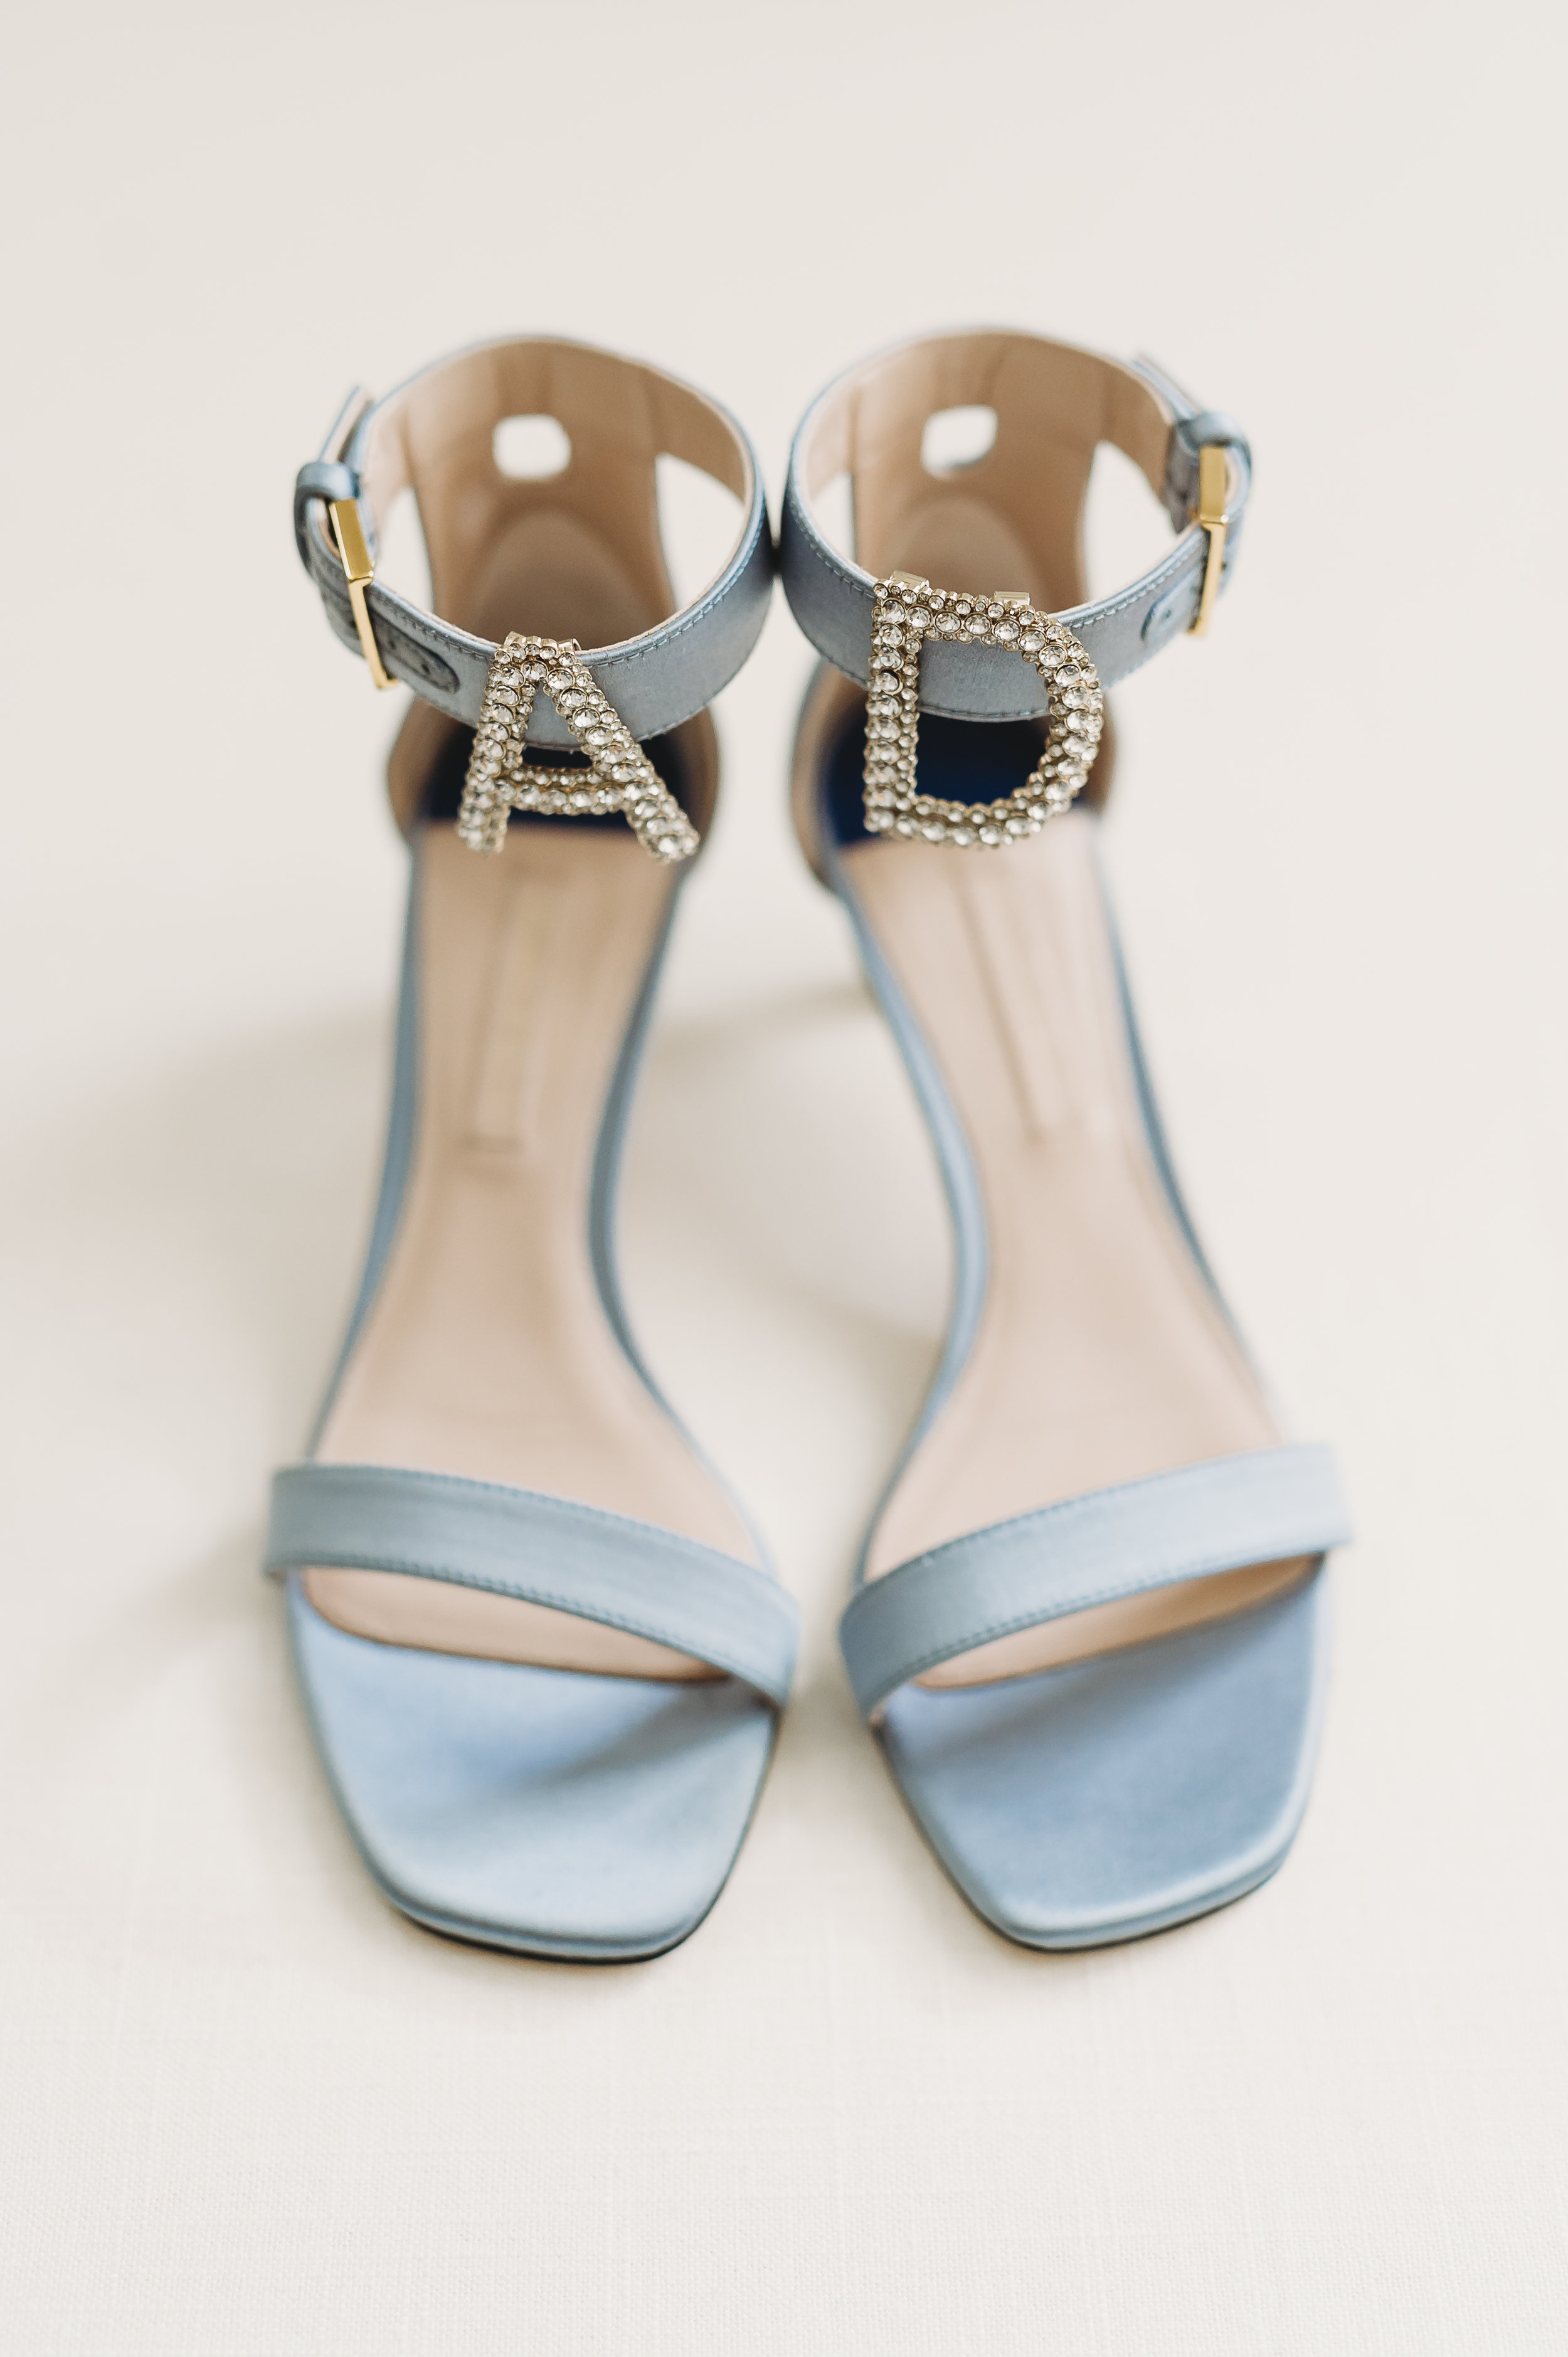 stuart weitzman bridal shoes CT wedding.JPG